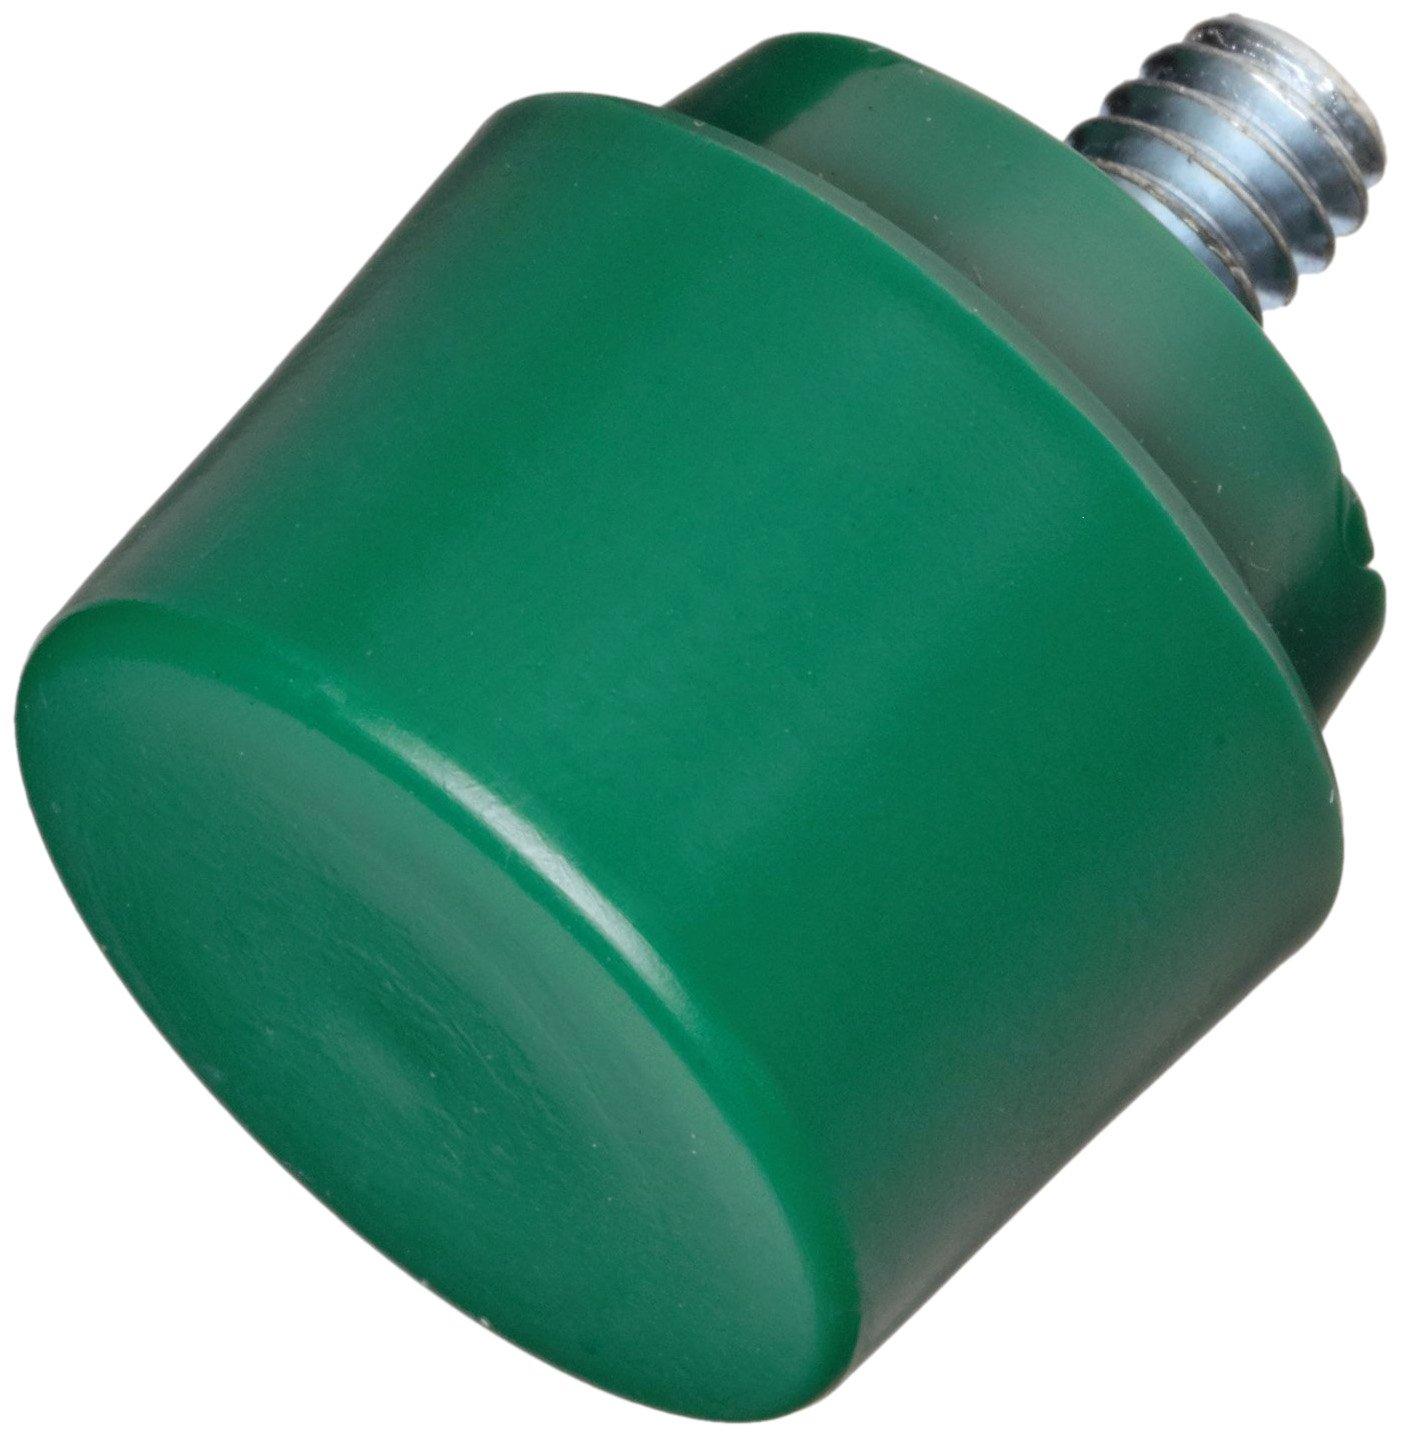 15104 NUPLA Hammer Tip,1 In Dia,Tough,Green Green